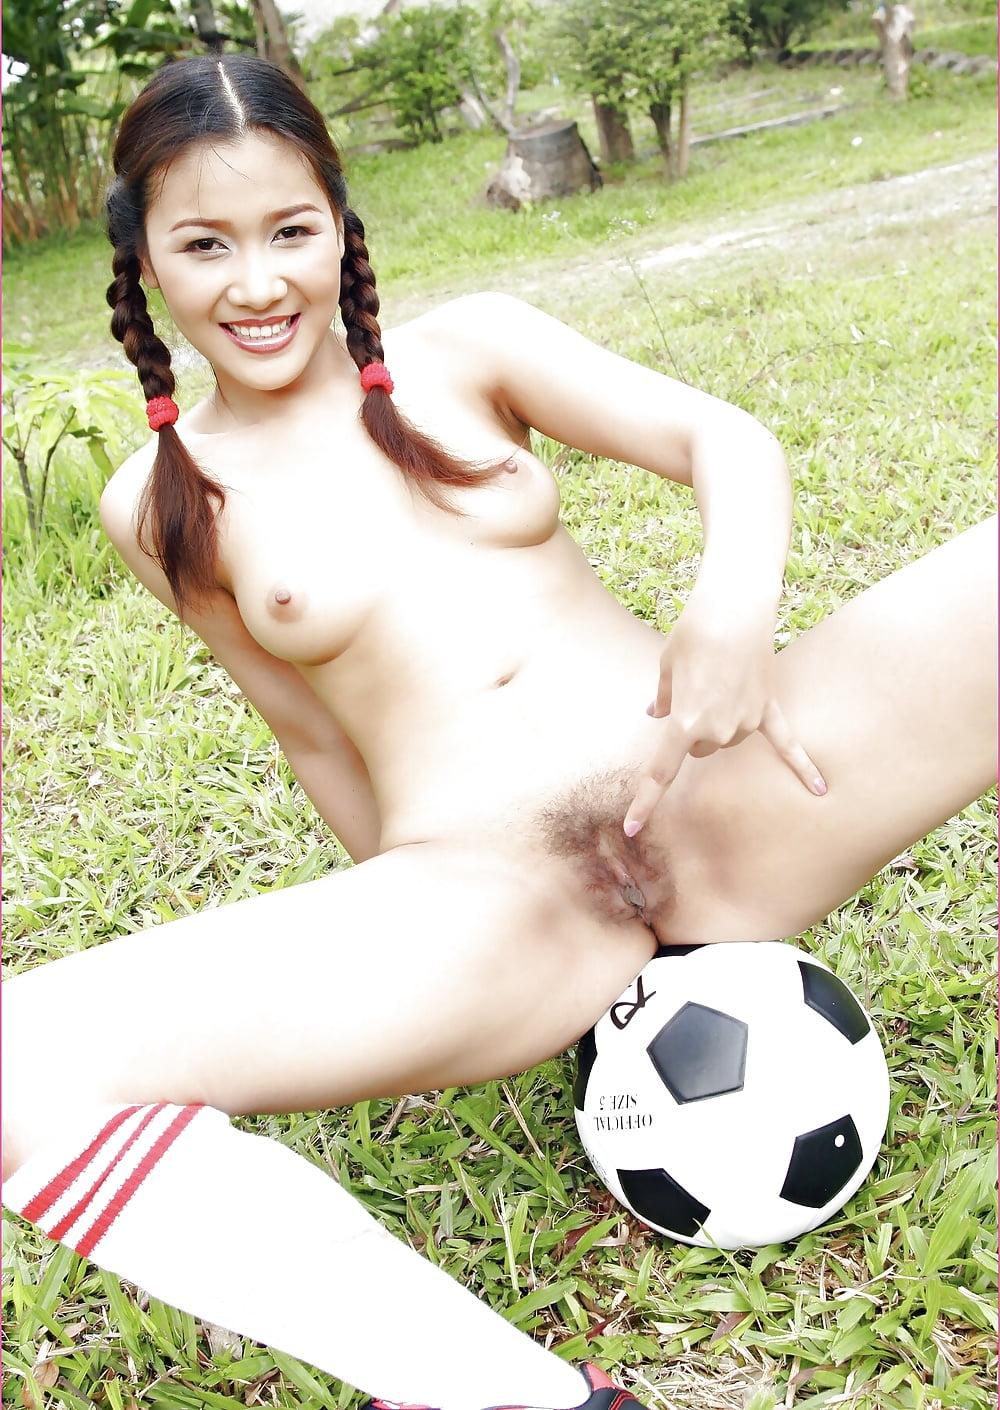 Soccer girls lick pussy — img 3